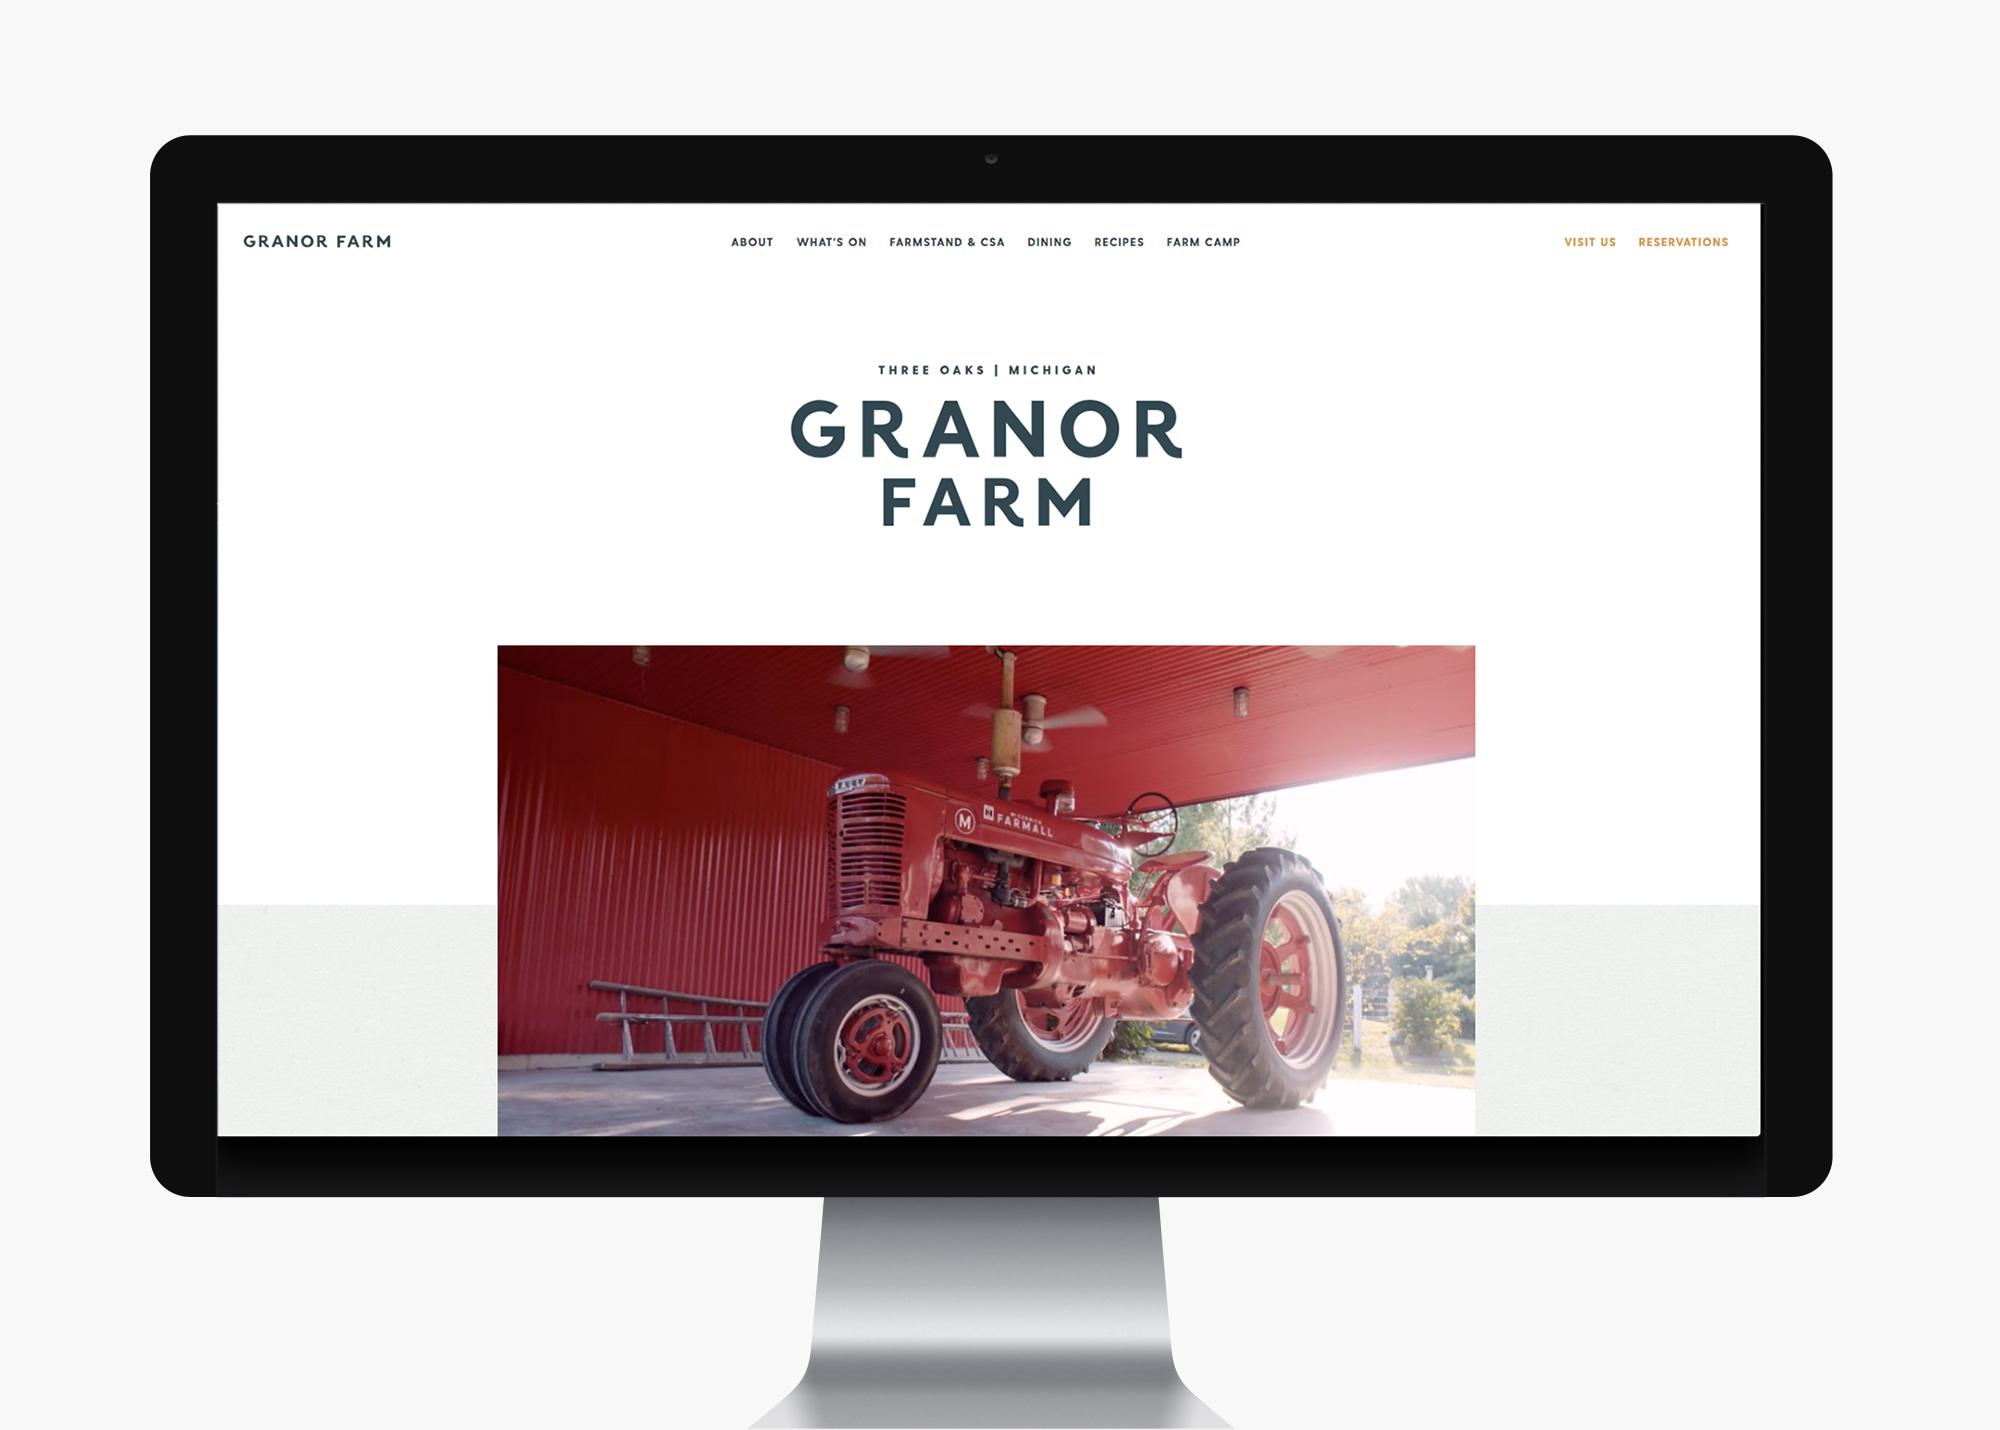 One Darnley Road Granor Farm Website 01